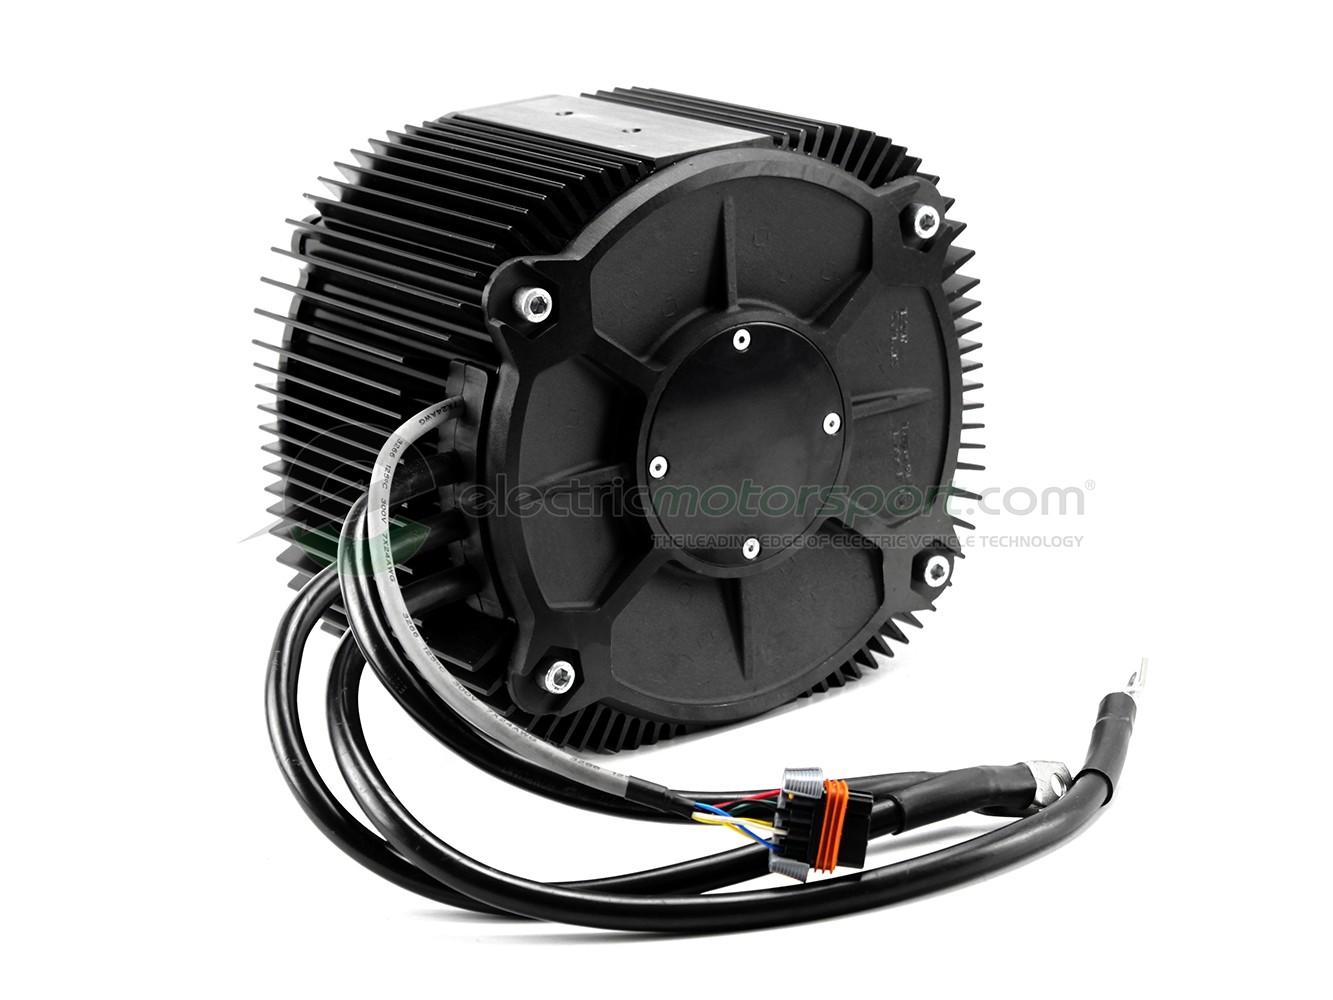 ME1507 Brushless 20 kW - 55 kW IPM Motor 48-120V